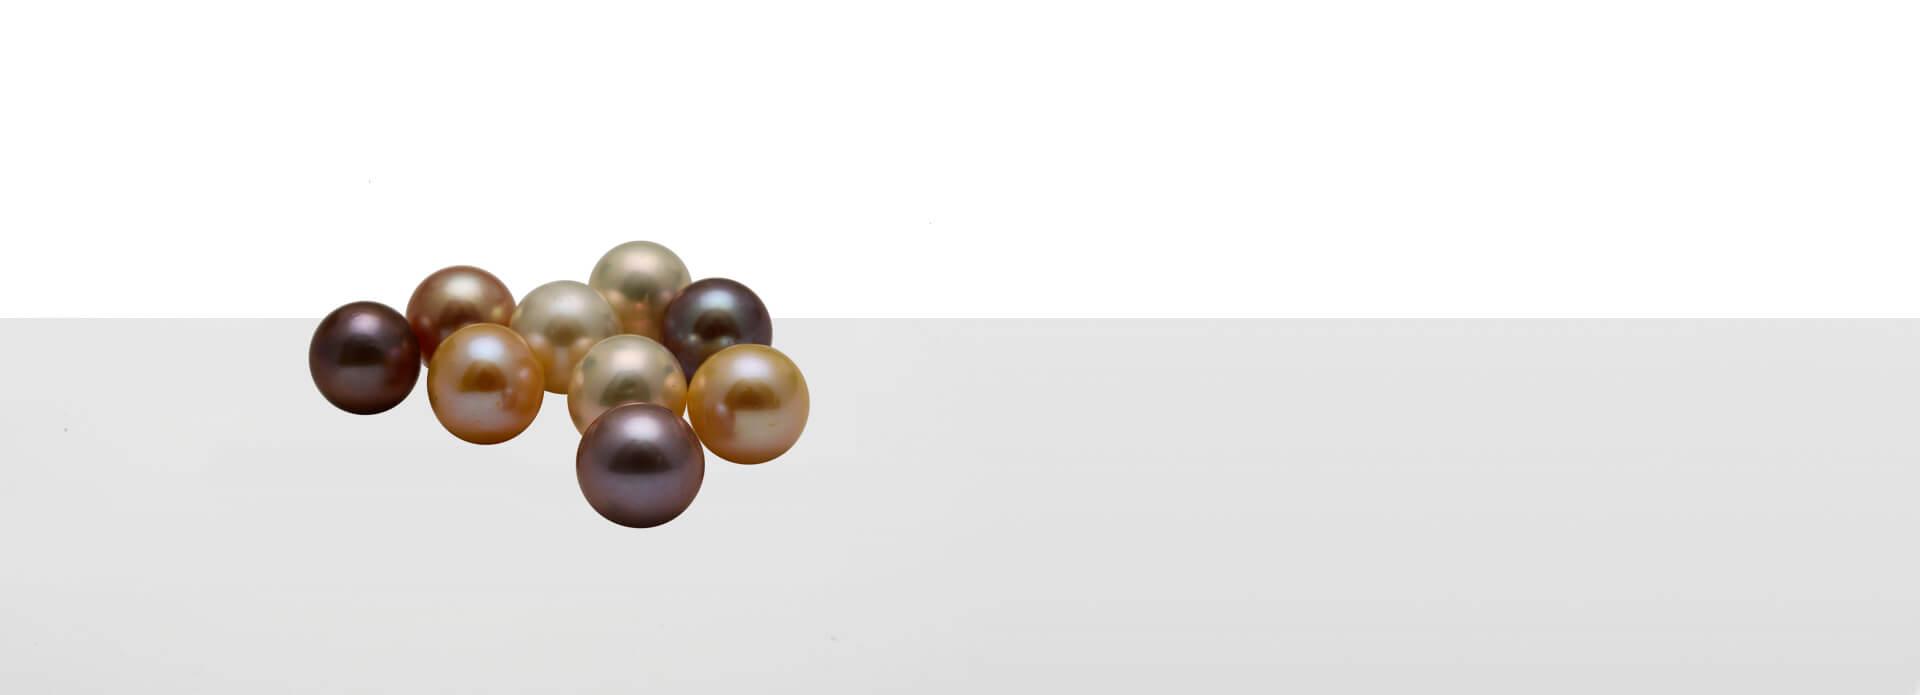 Loose Freshwater Pearls